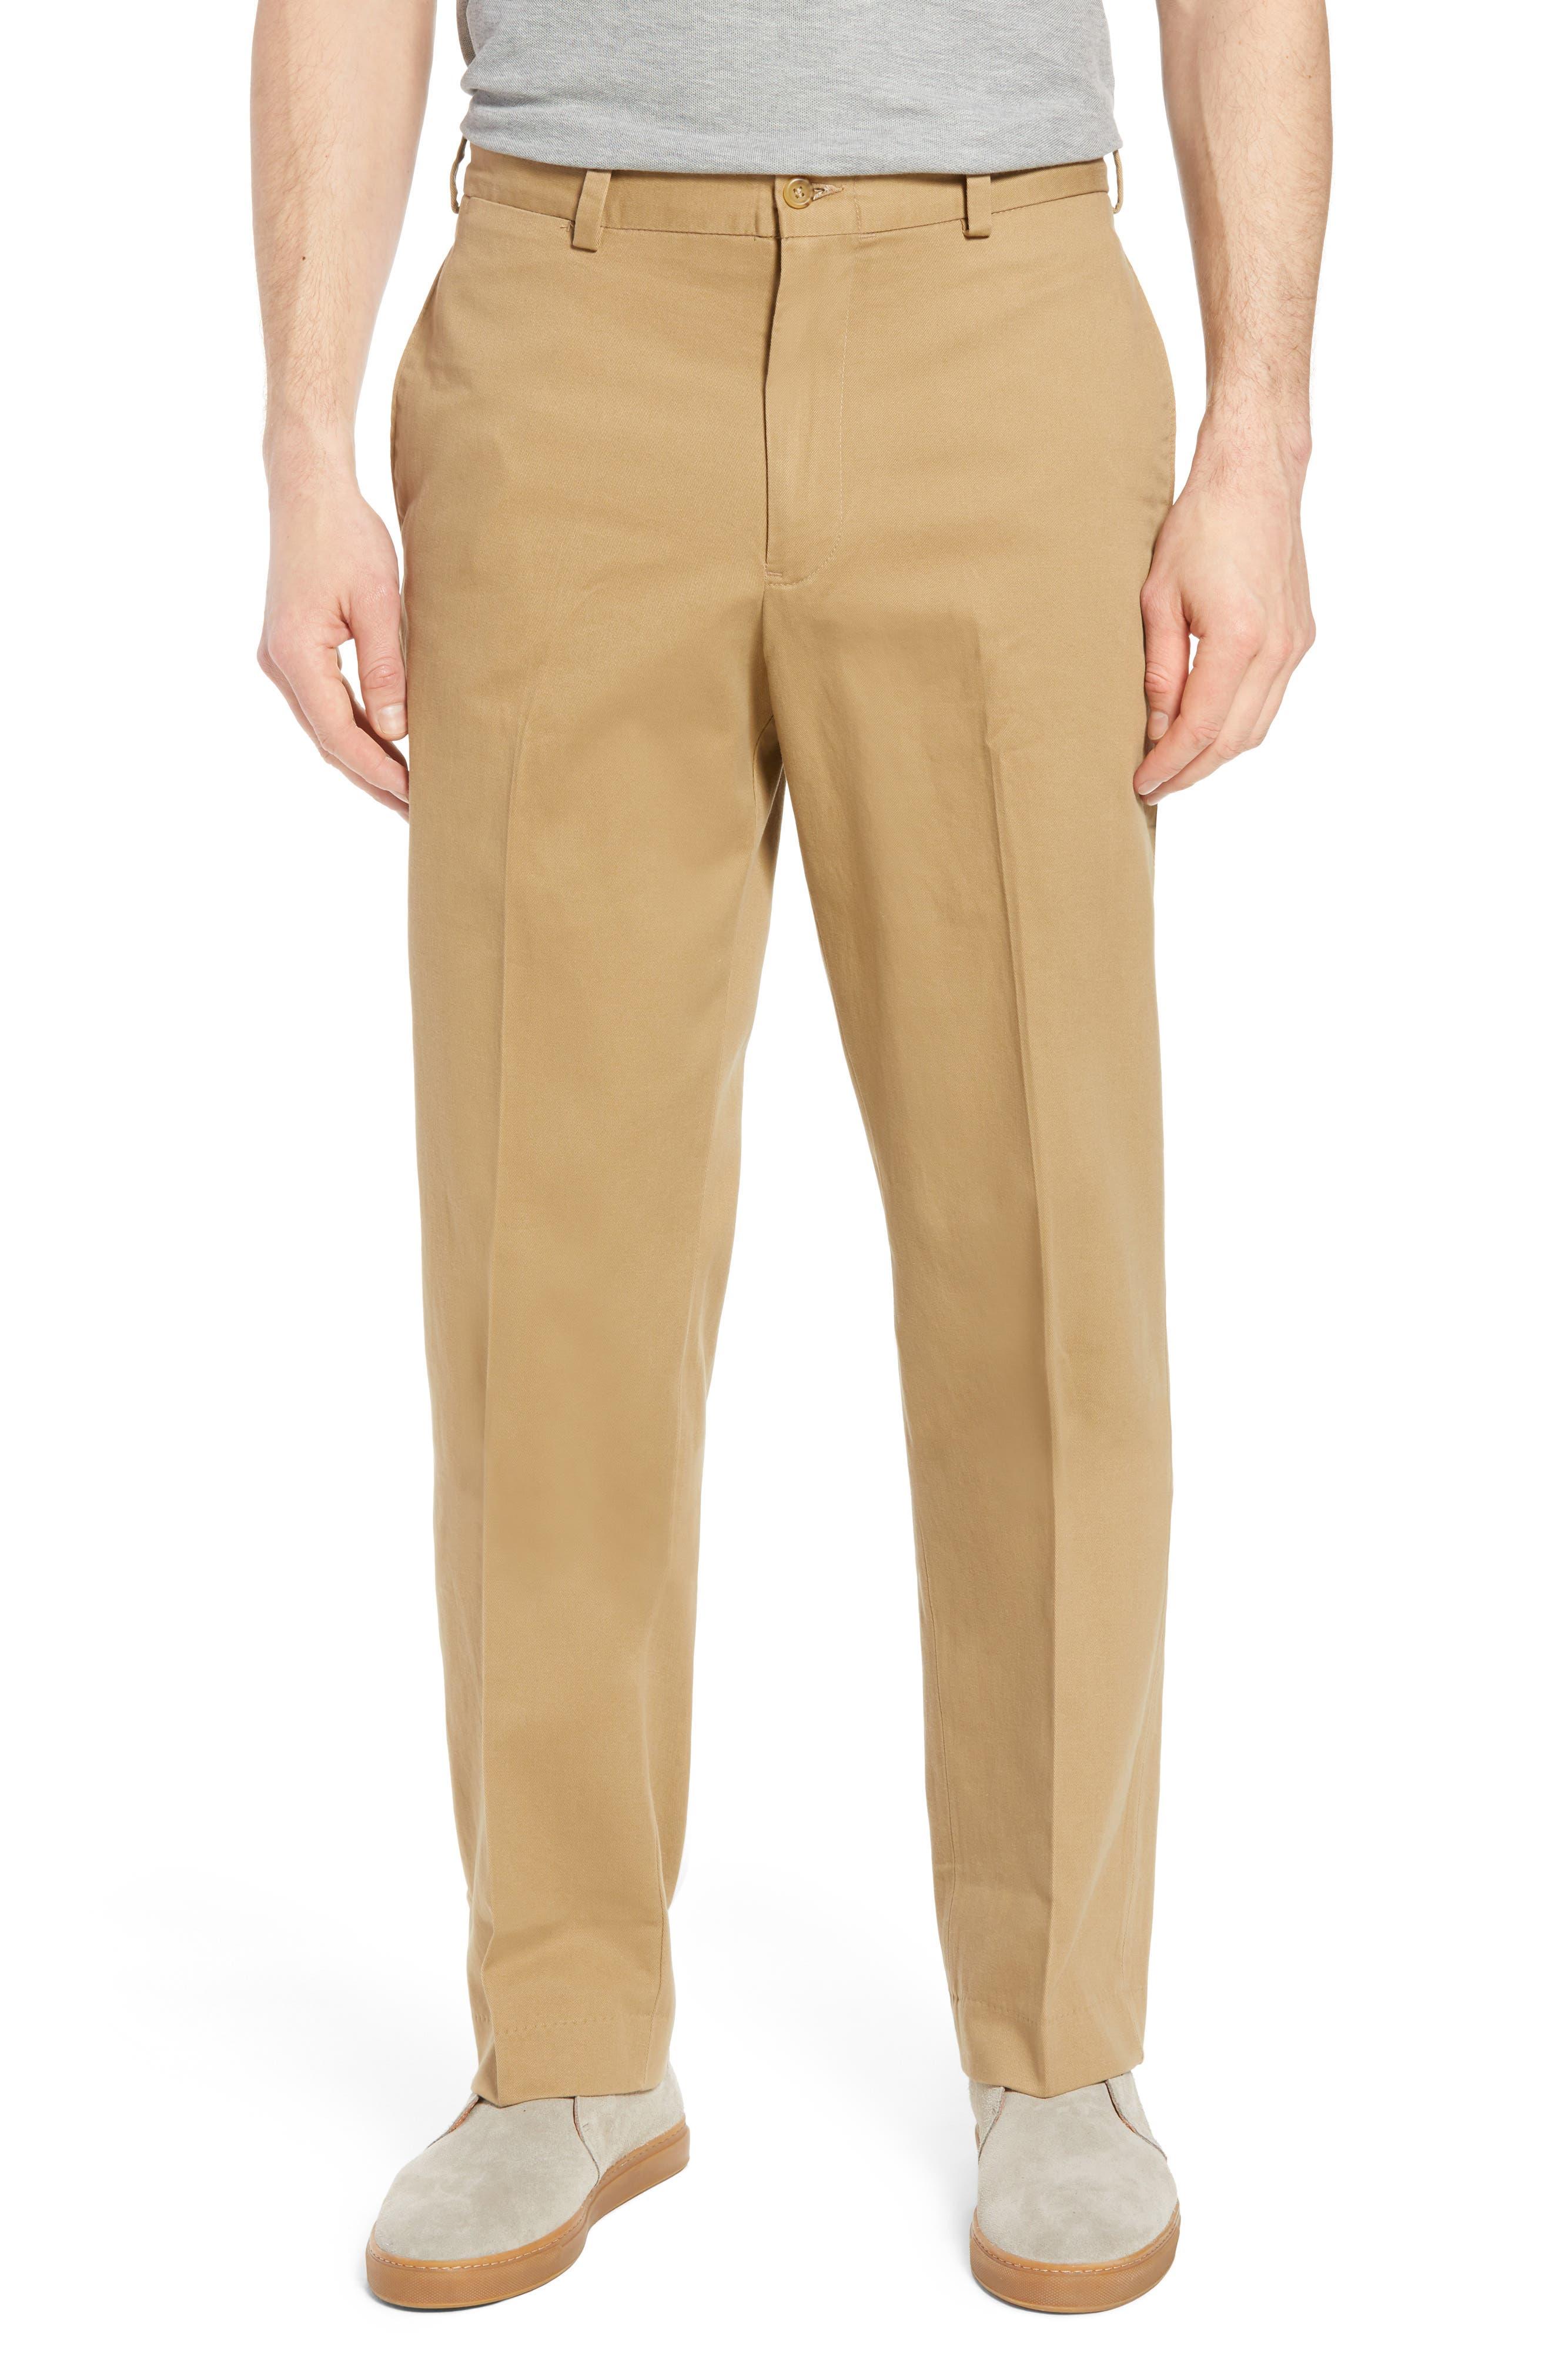 Bills Khakis M2 Classic Fit Flat Front Vintage Twill Pants